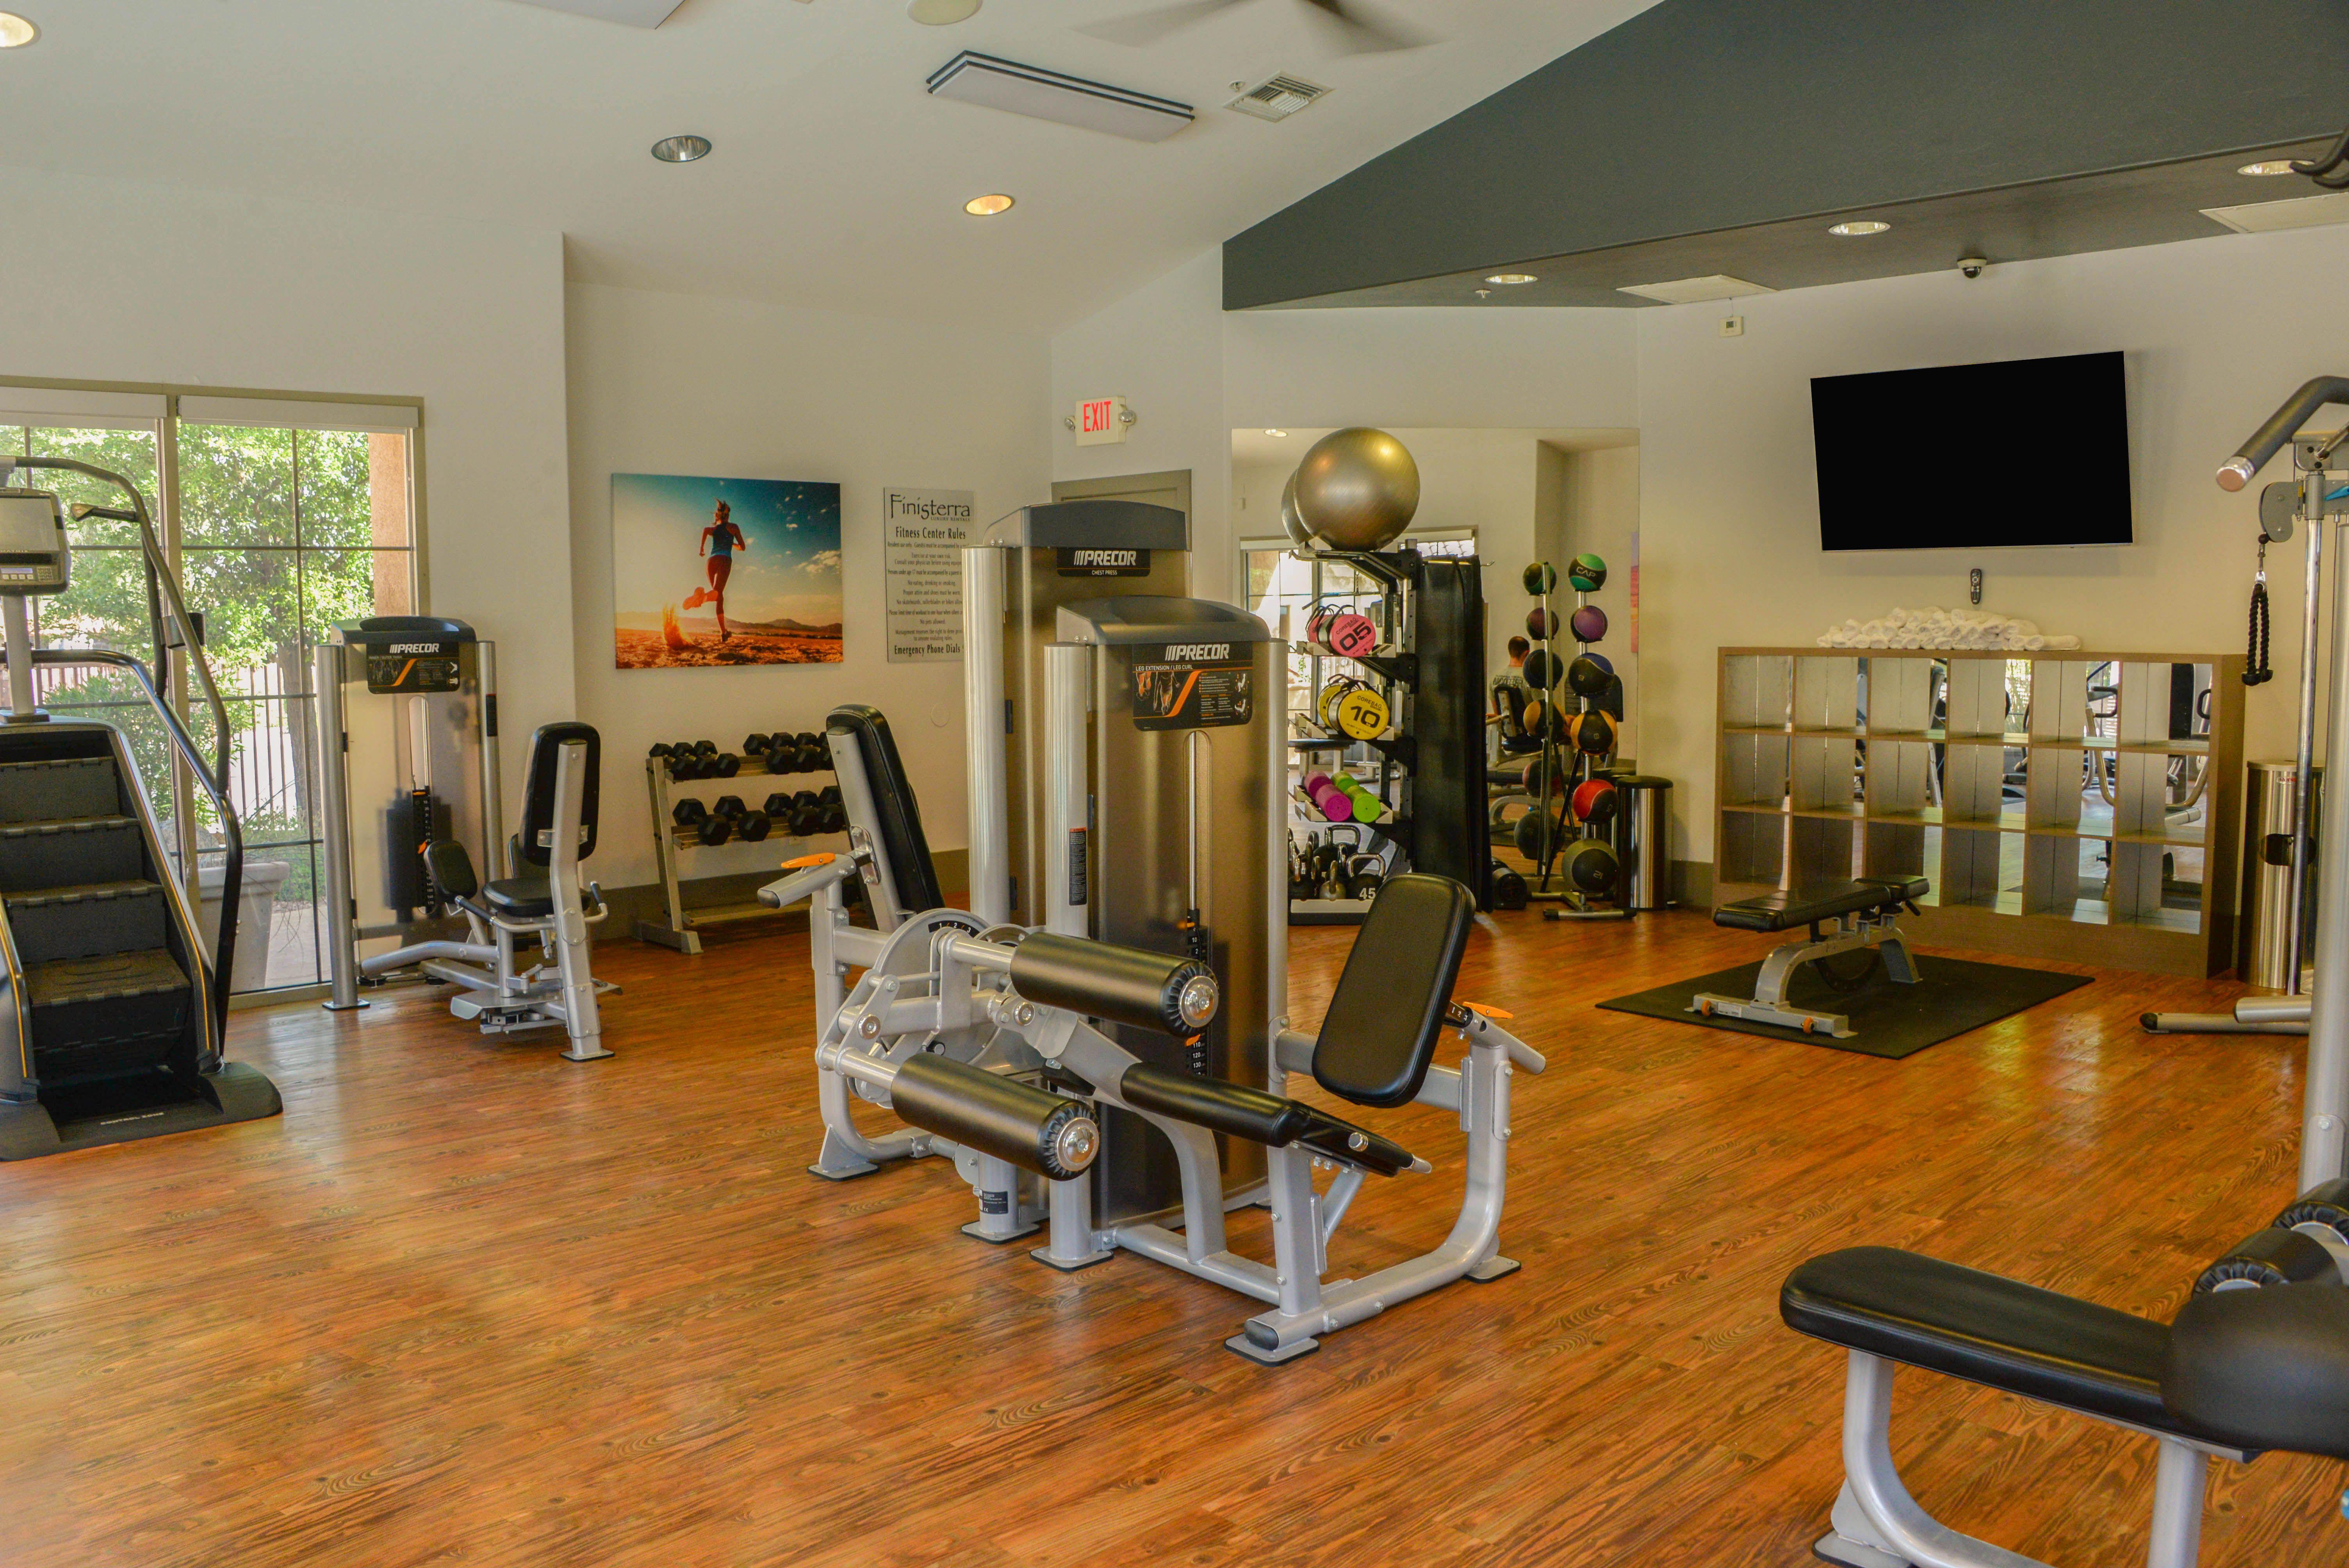 Stateoftheart Fitness Room Luxury apartments, Rental